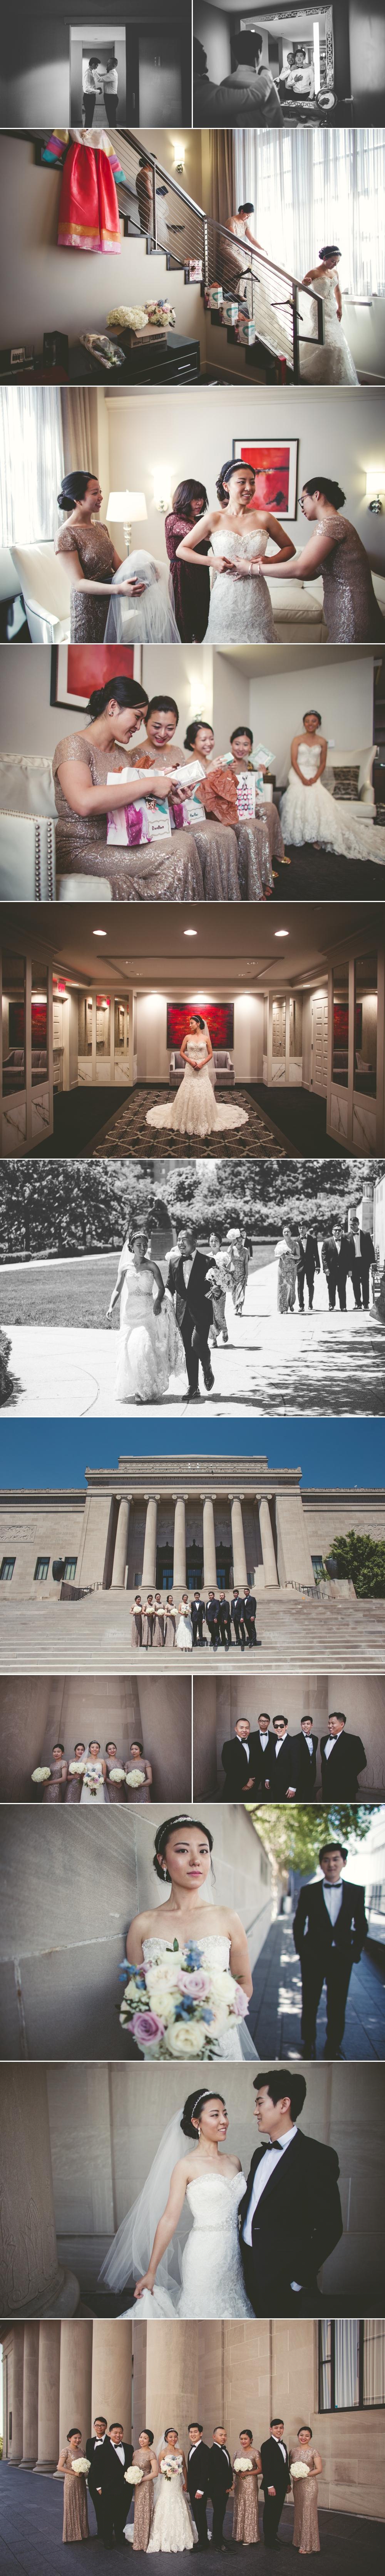 jason_domingues_photography_best_kansas_city_wedding_photographer_kc_weddings_korean_tea_ceremony_mark_twain_ballroom_0002